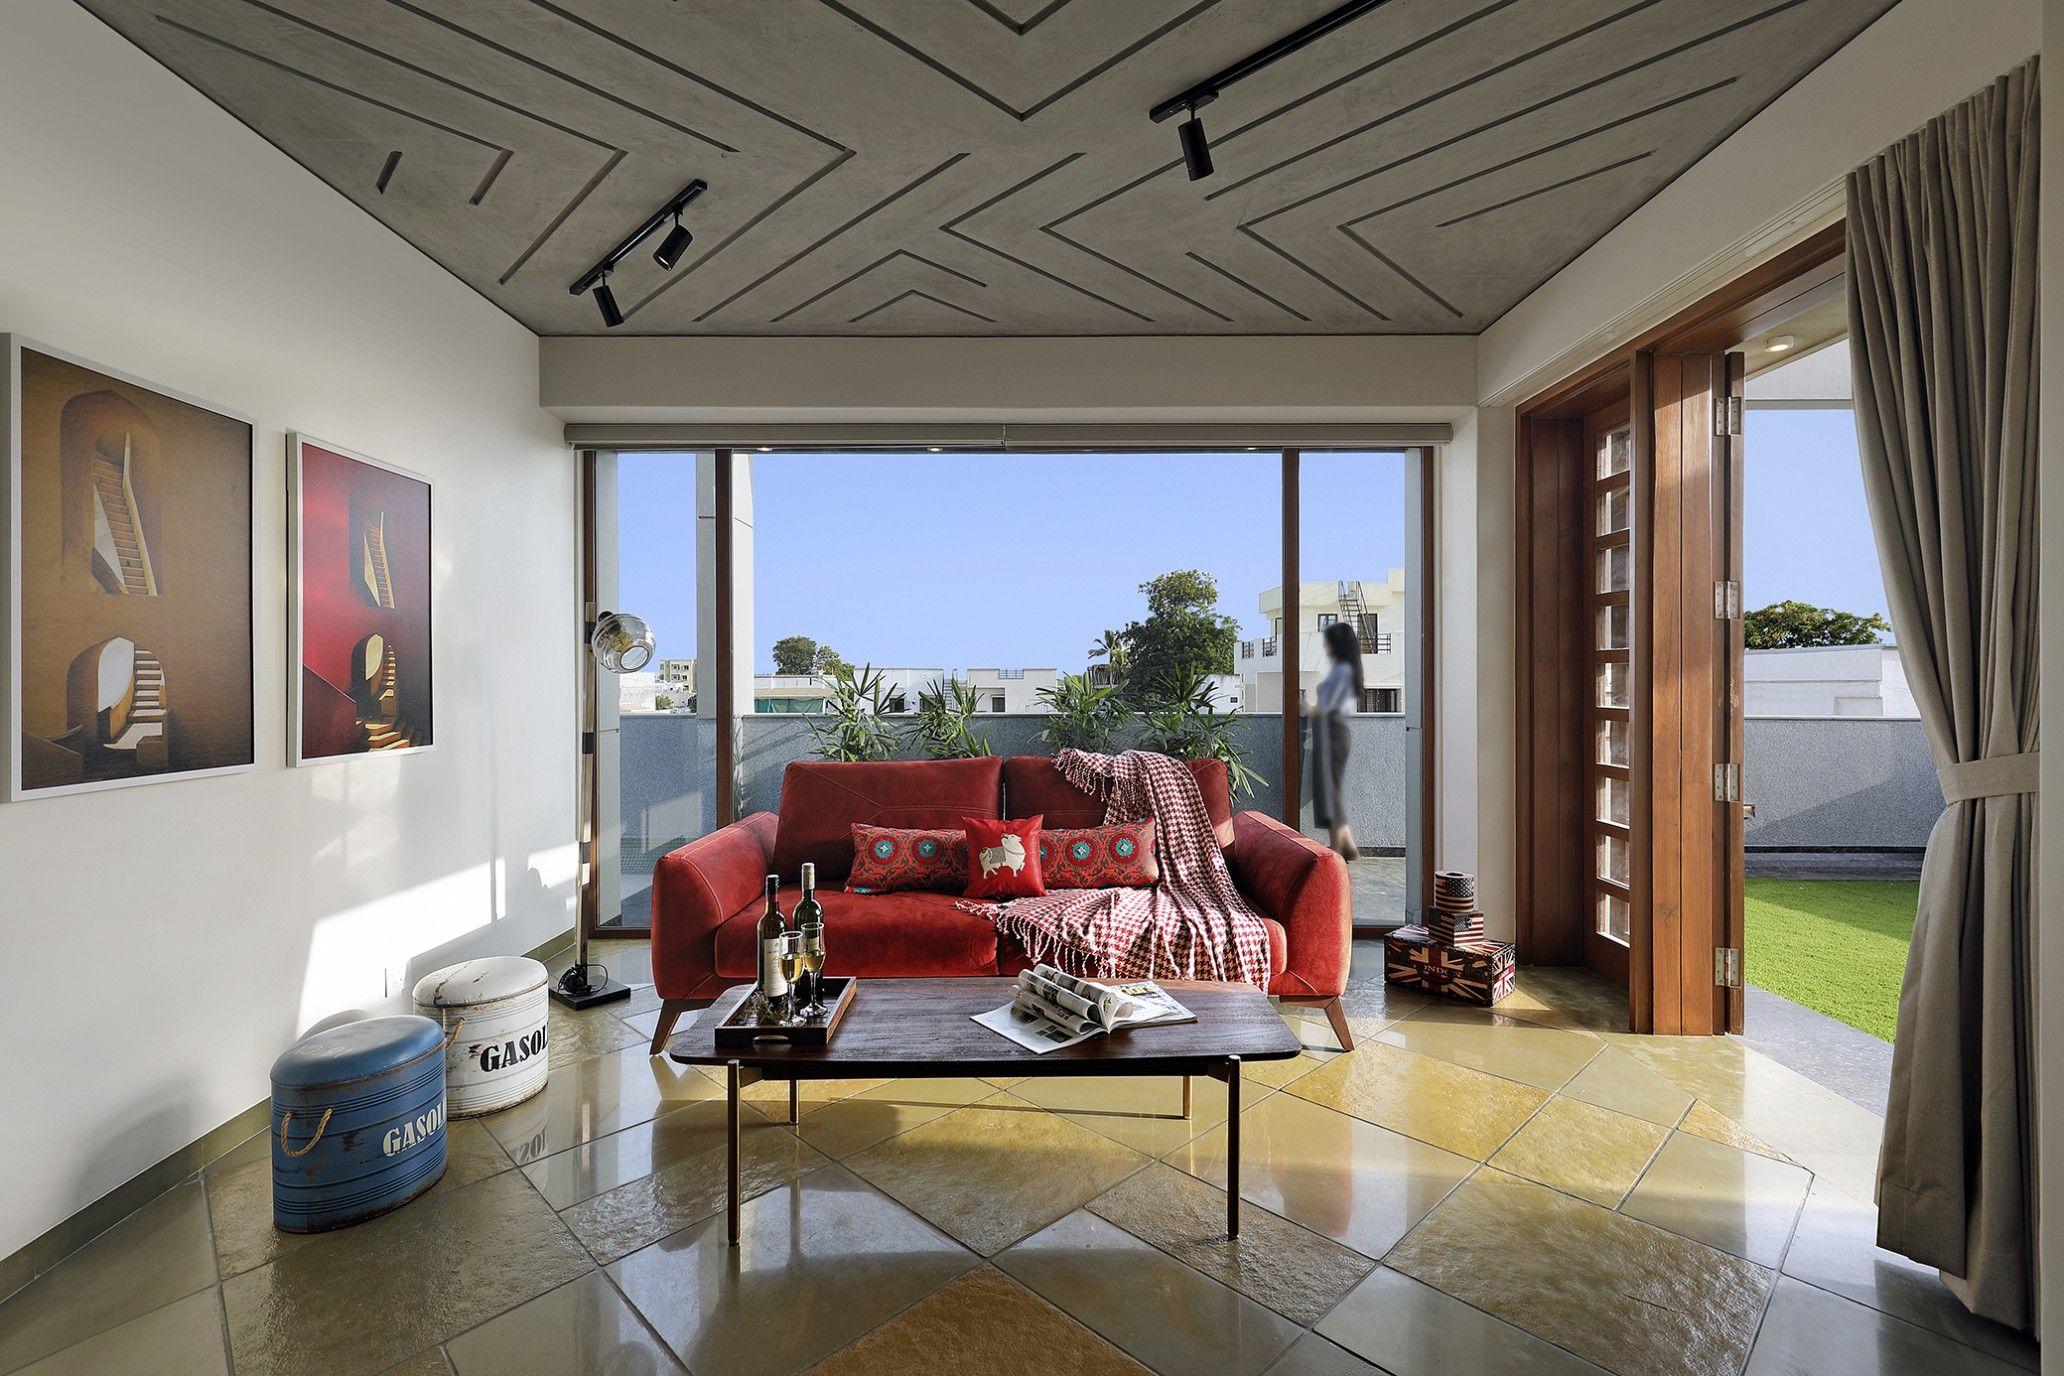 45 Brick House A T Associates Stone Flooring Living Room House Interior Decor Store Design Interior #stone #flooring #in #living #room